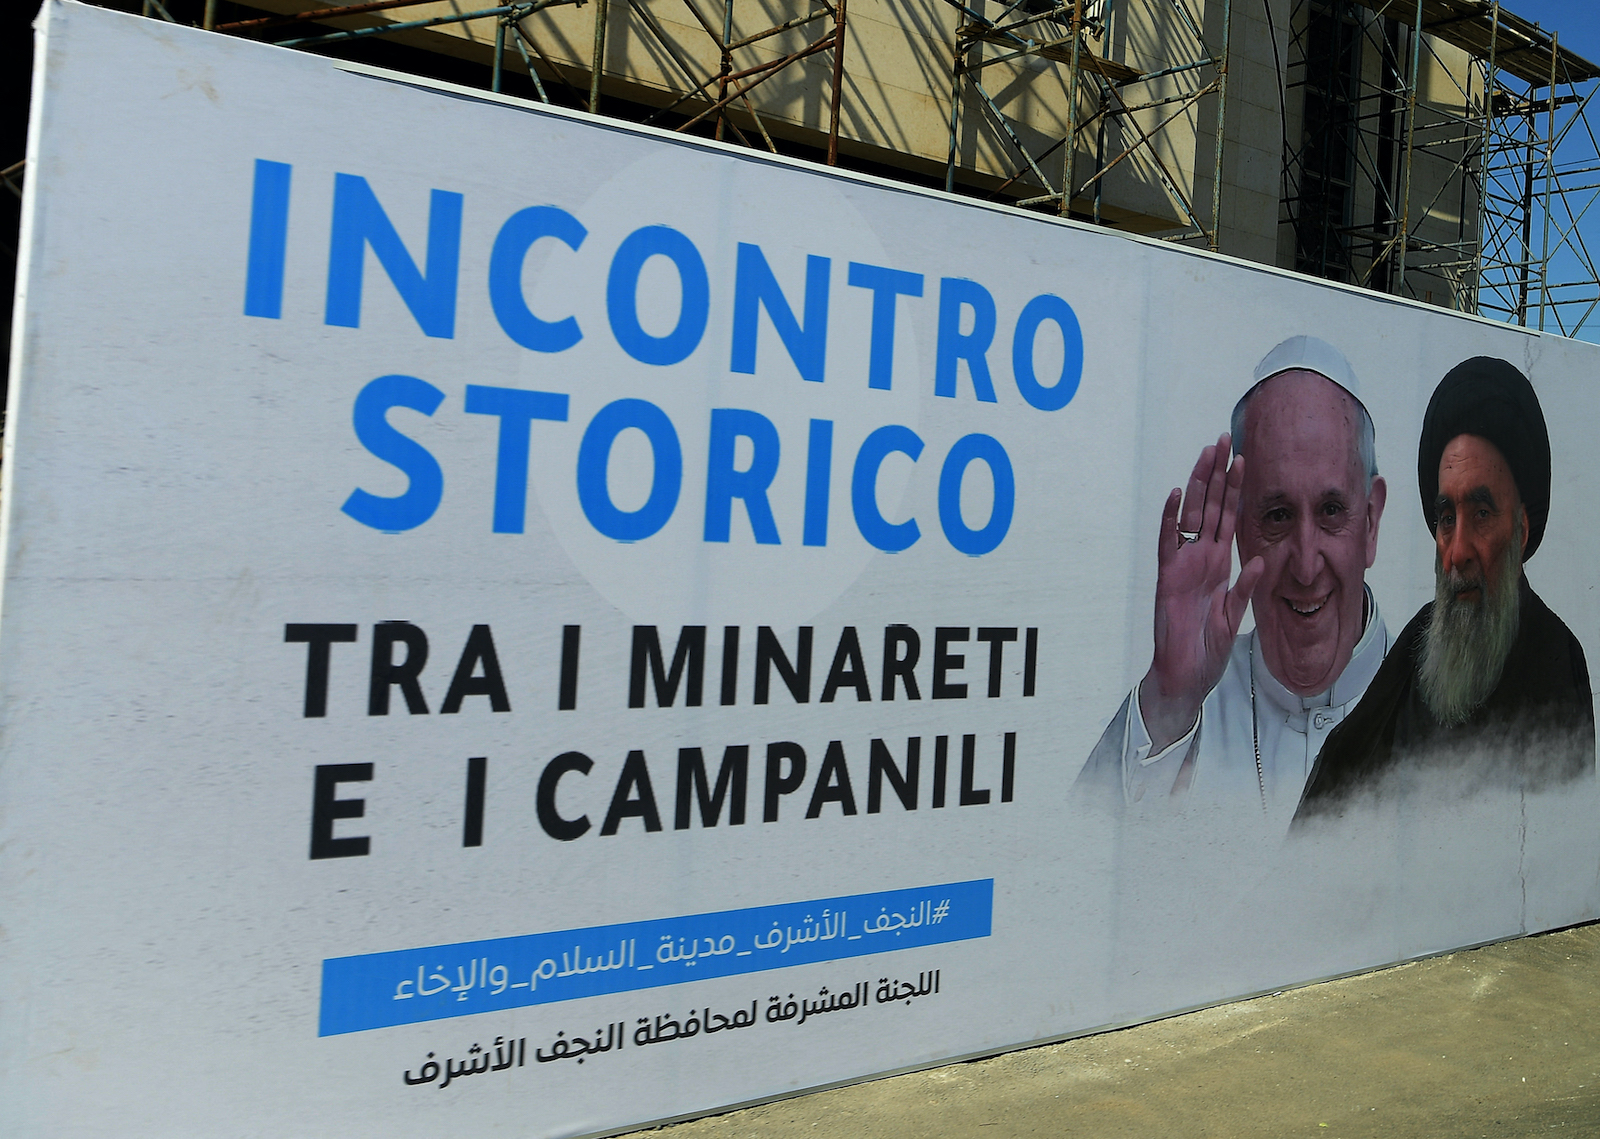 A billboard marking the meeting. Photo: AFP / Vatican Media